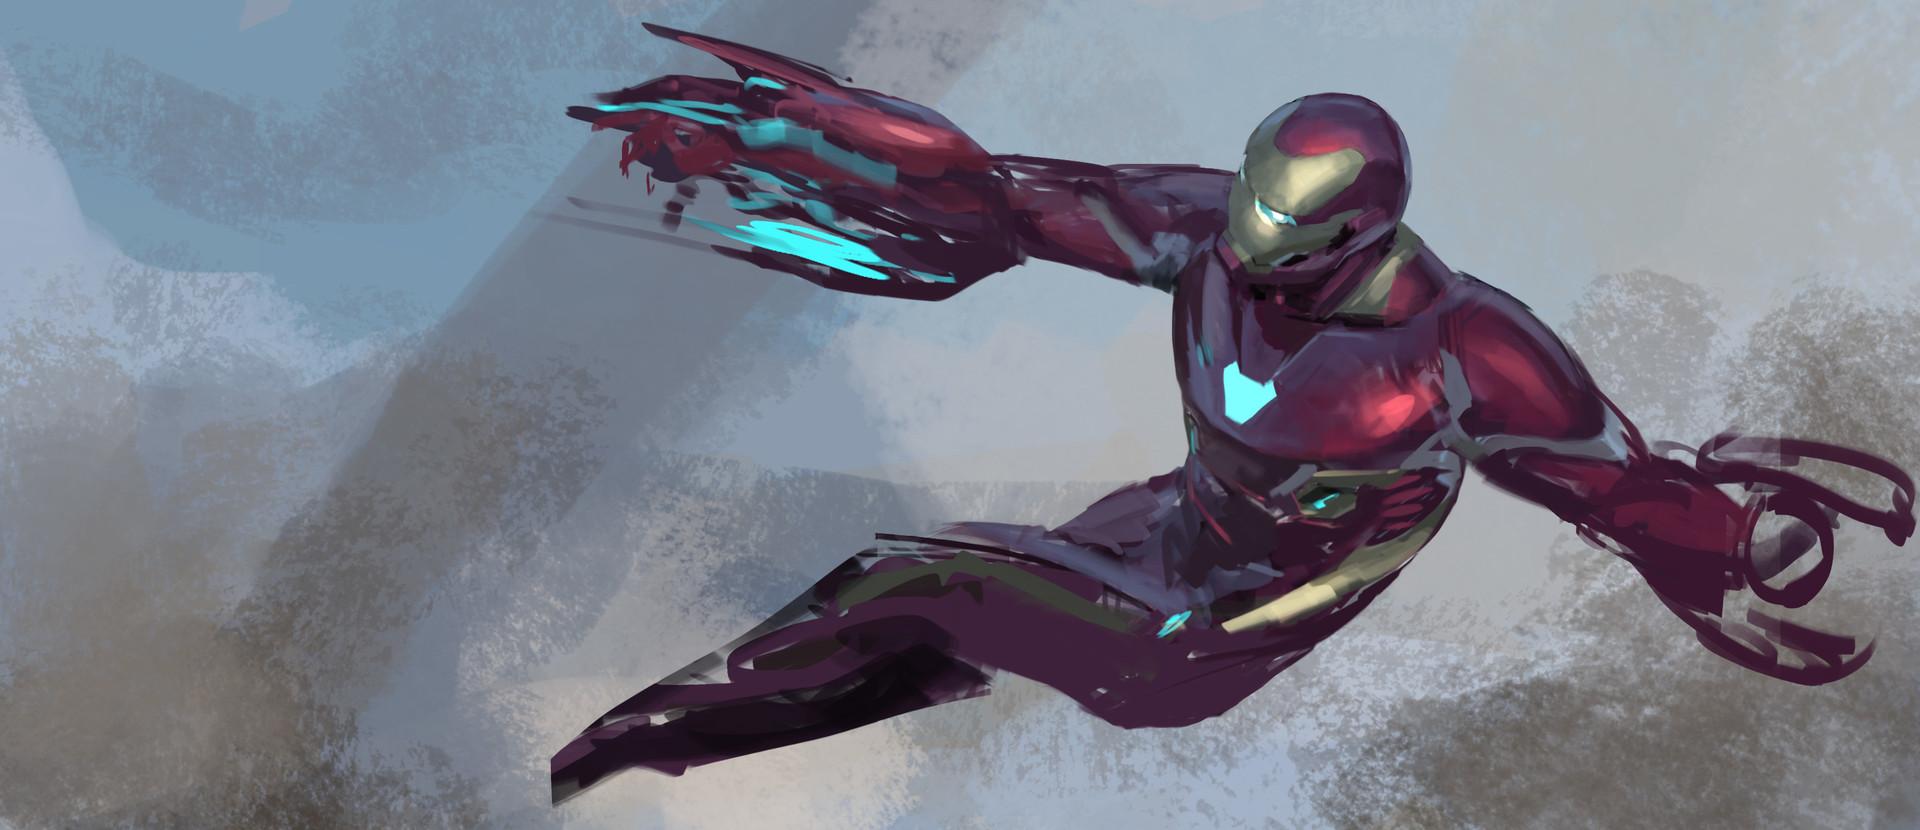 Infinity War Iron Man Mark 50 Concept Art Revealed Cosmic Book News